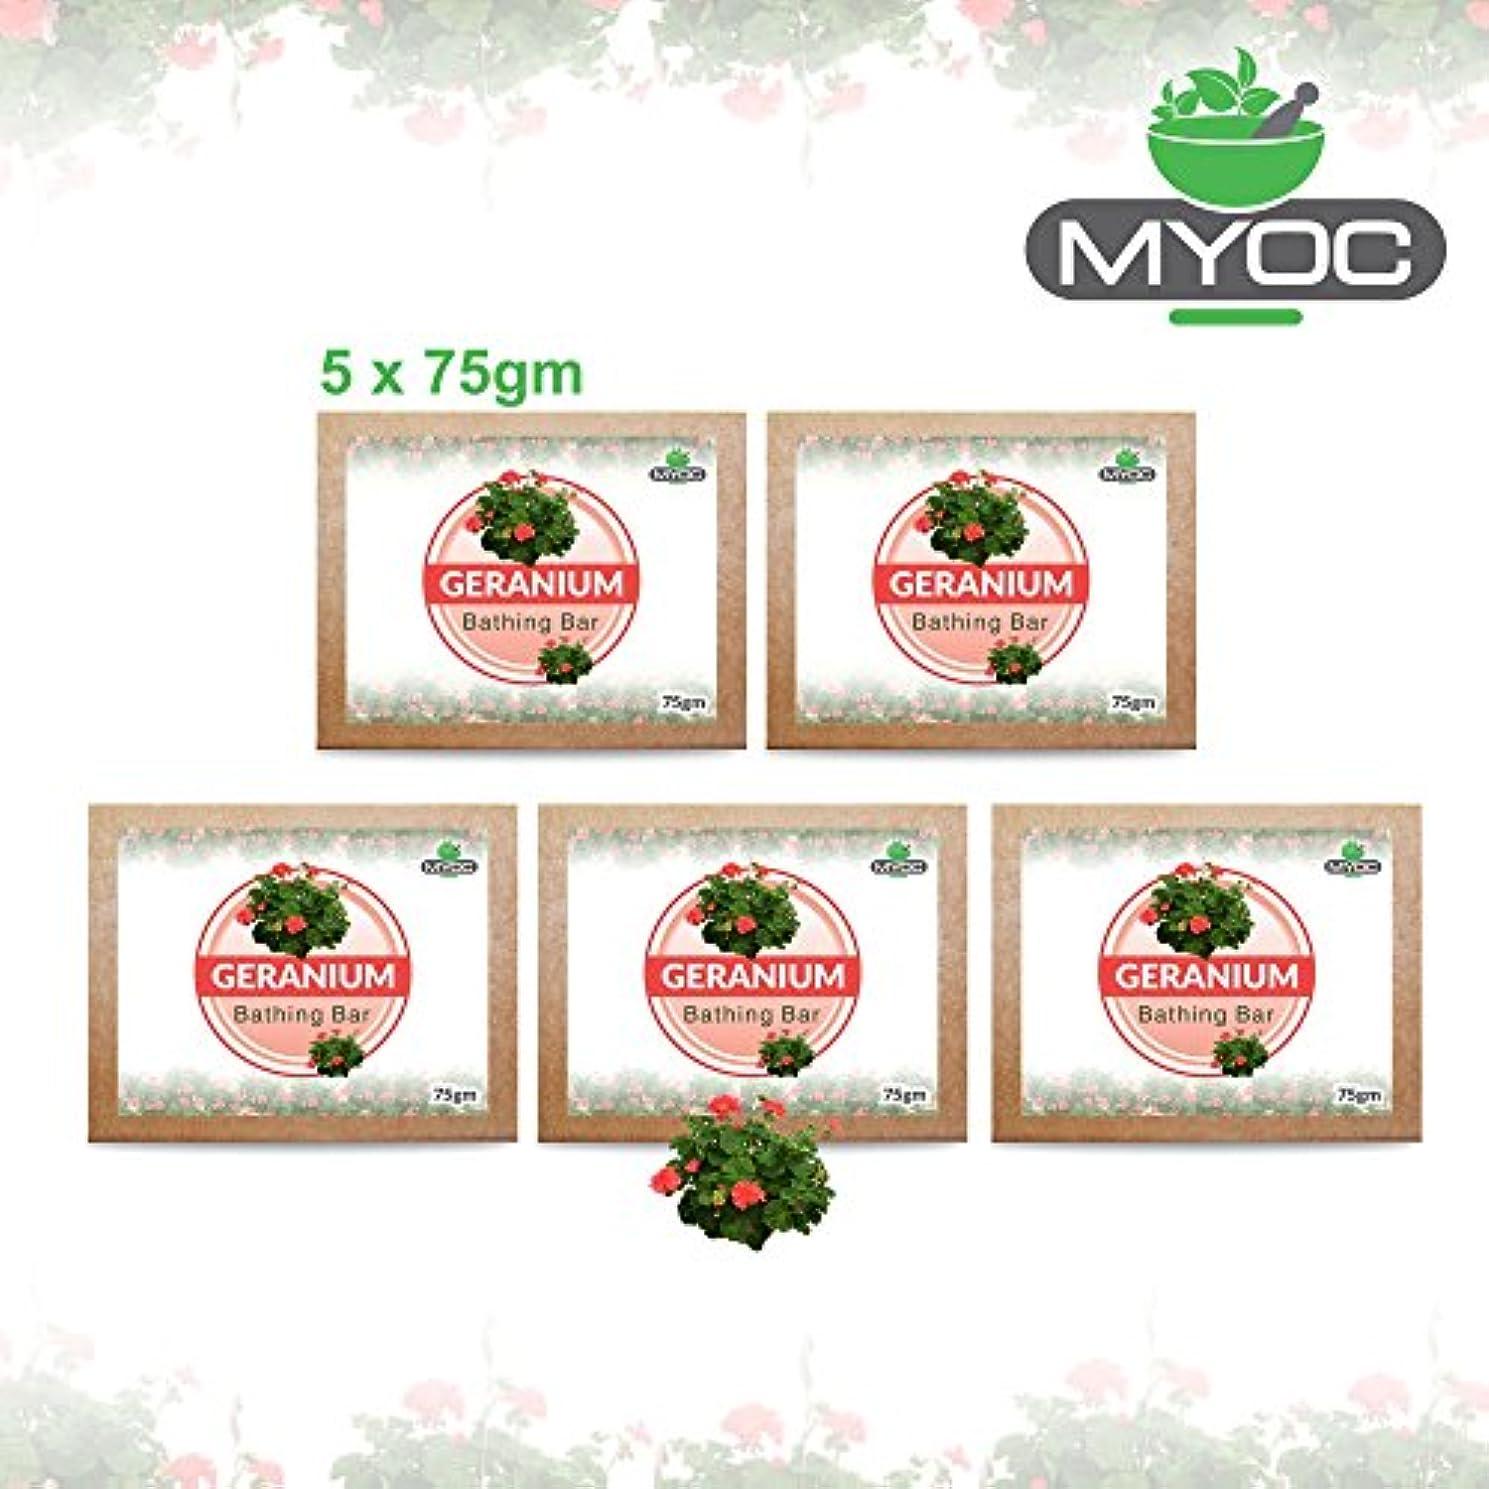 Geranium Oil soap an excellent moisturizer for mature, dry skin 75gm. X 5 Pack